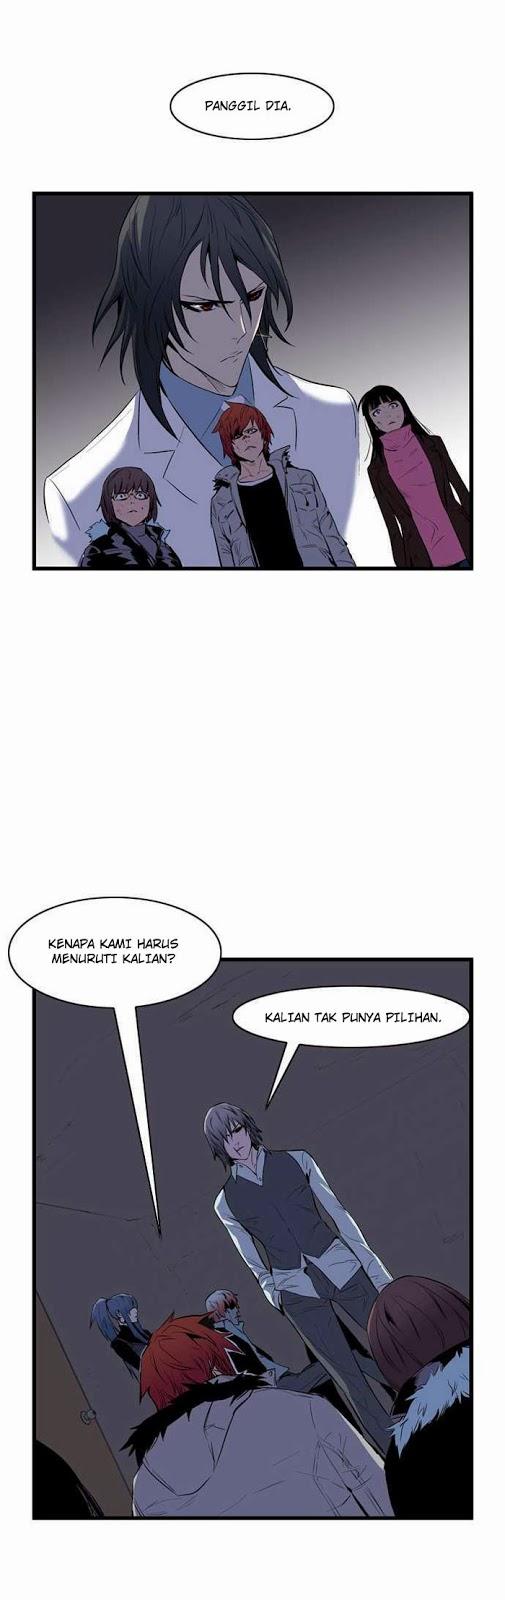 Komik noblesse 067 68 Indonesia noblesse 067 Terbaru 7|Baca Manga Komik Indonesia|